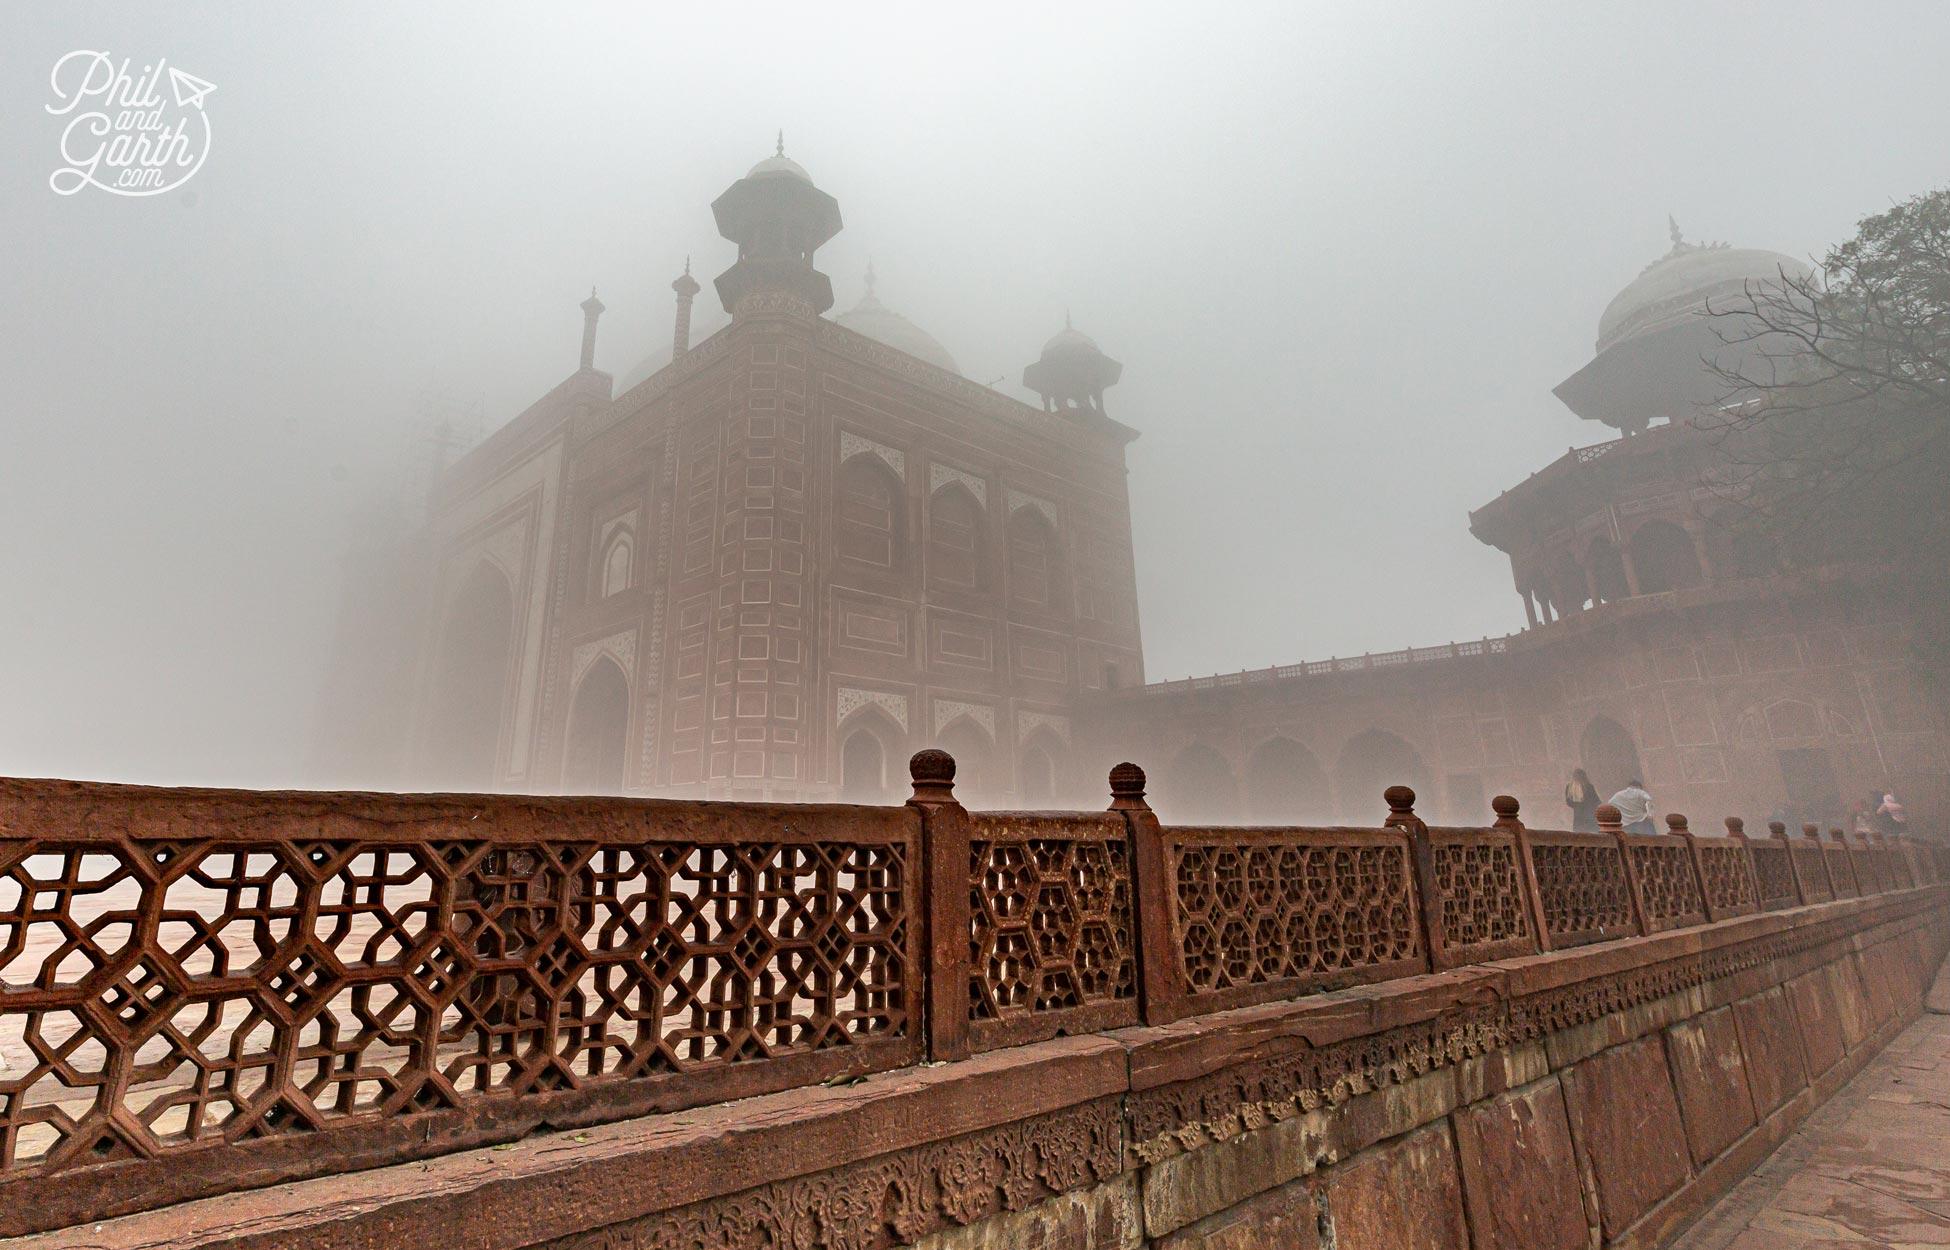 The Mehmaan Khana guest house appearing through the fog